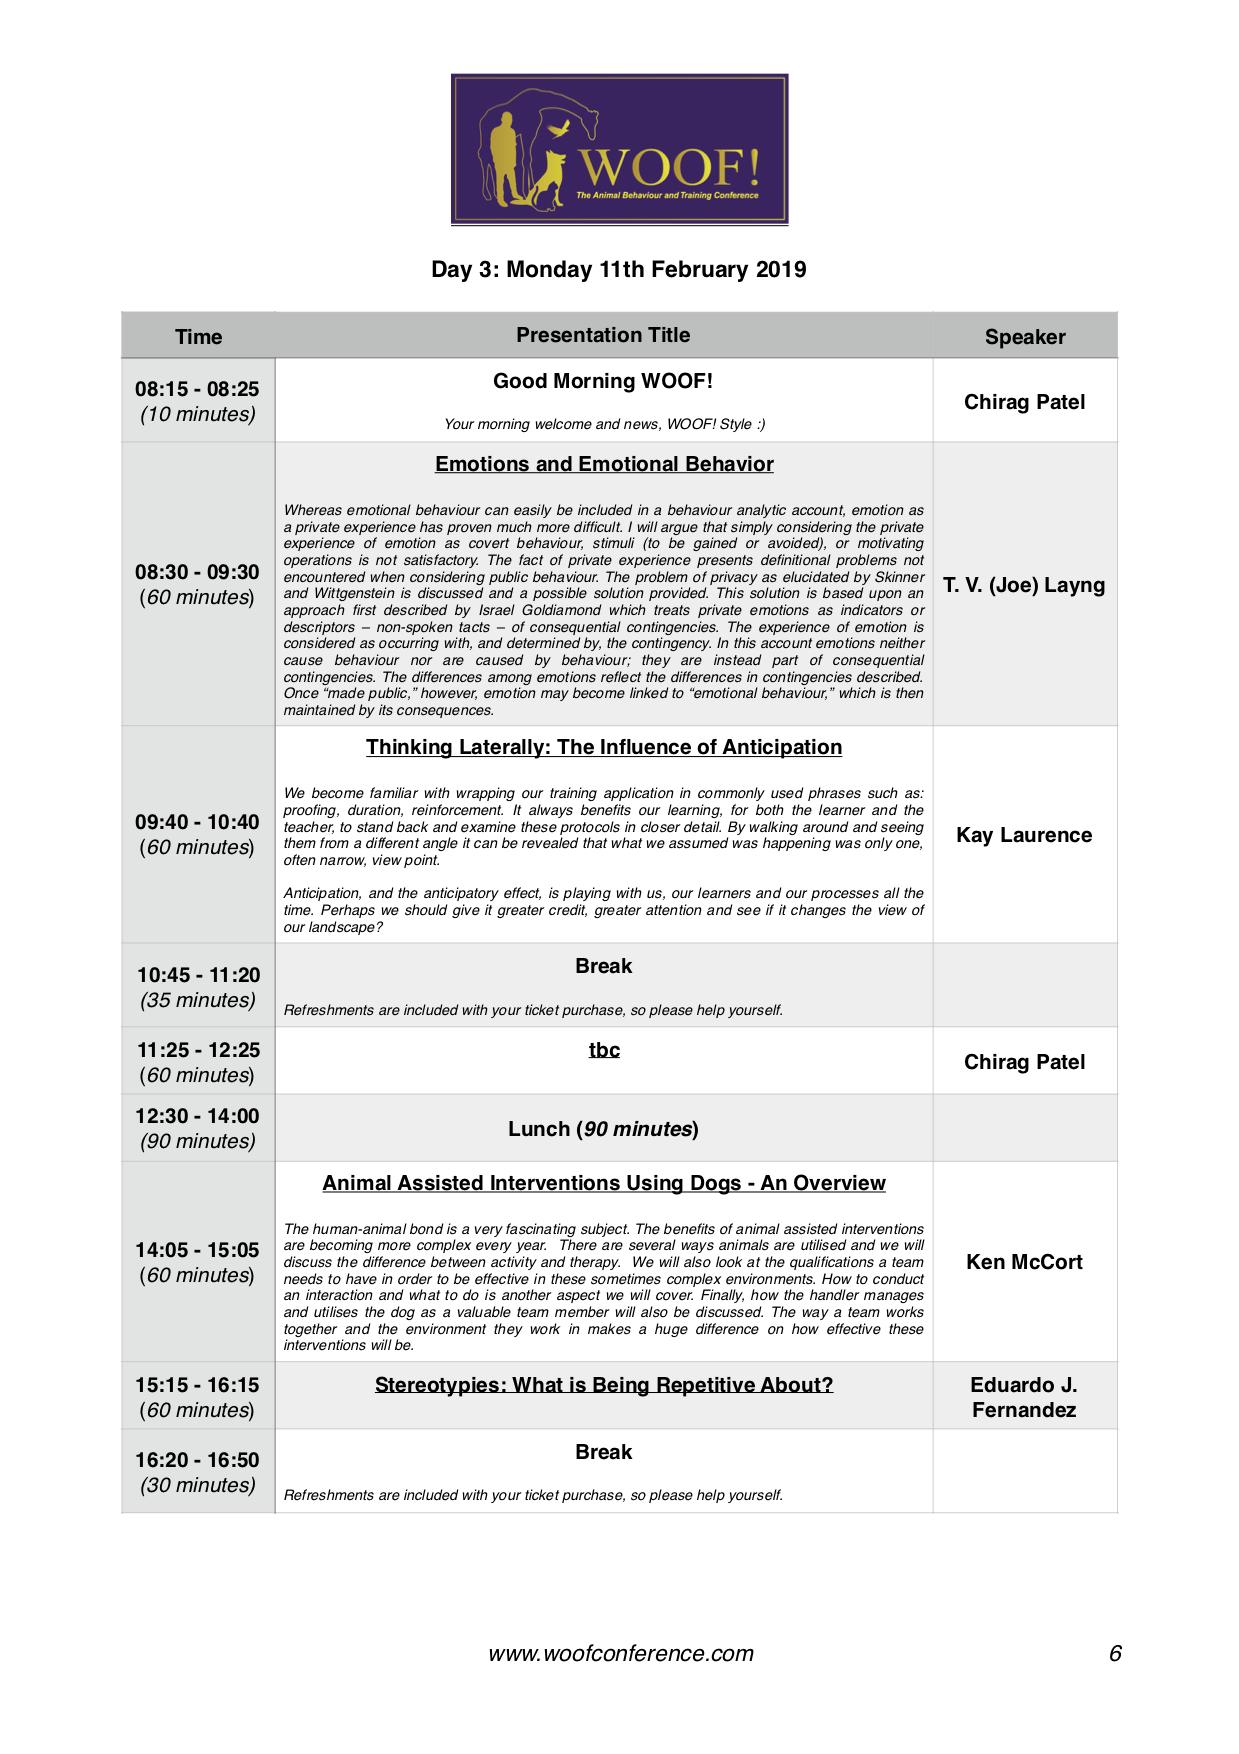 WOOF! 2019 Schedule Public 1.0 Page 6.jpg